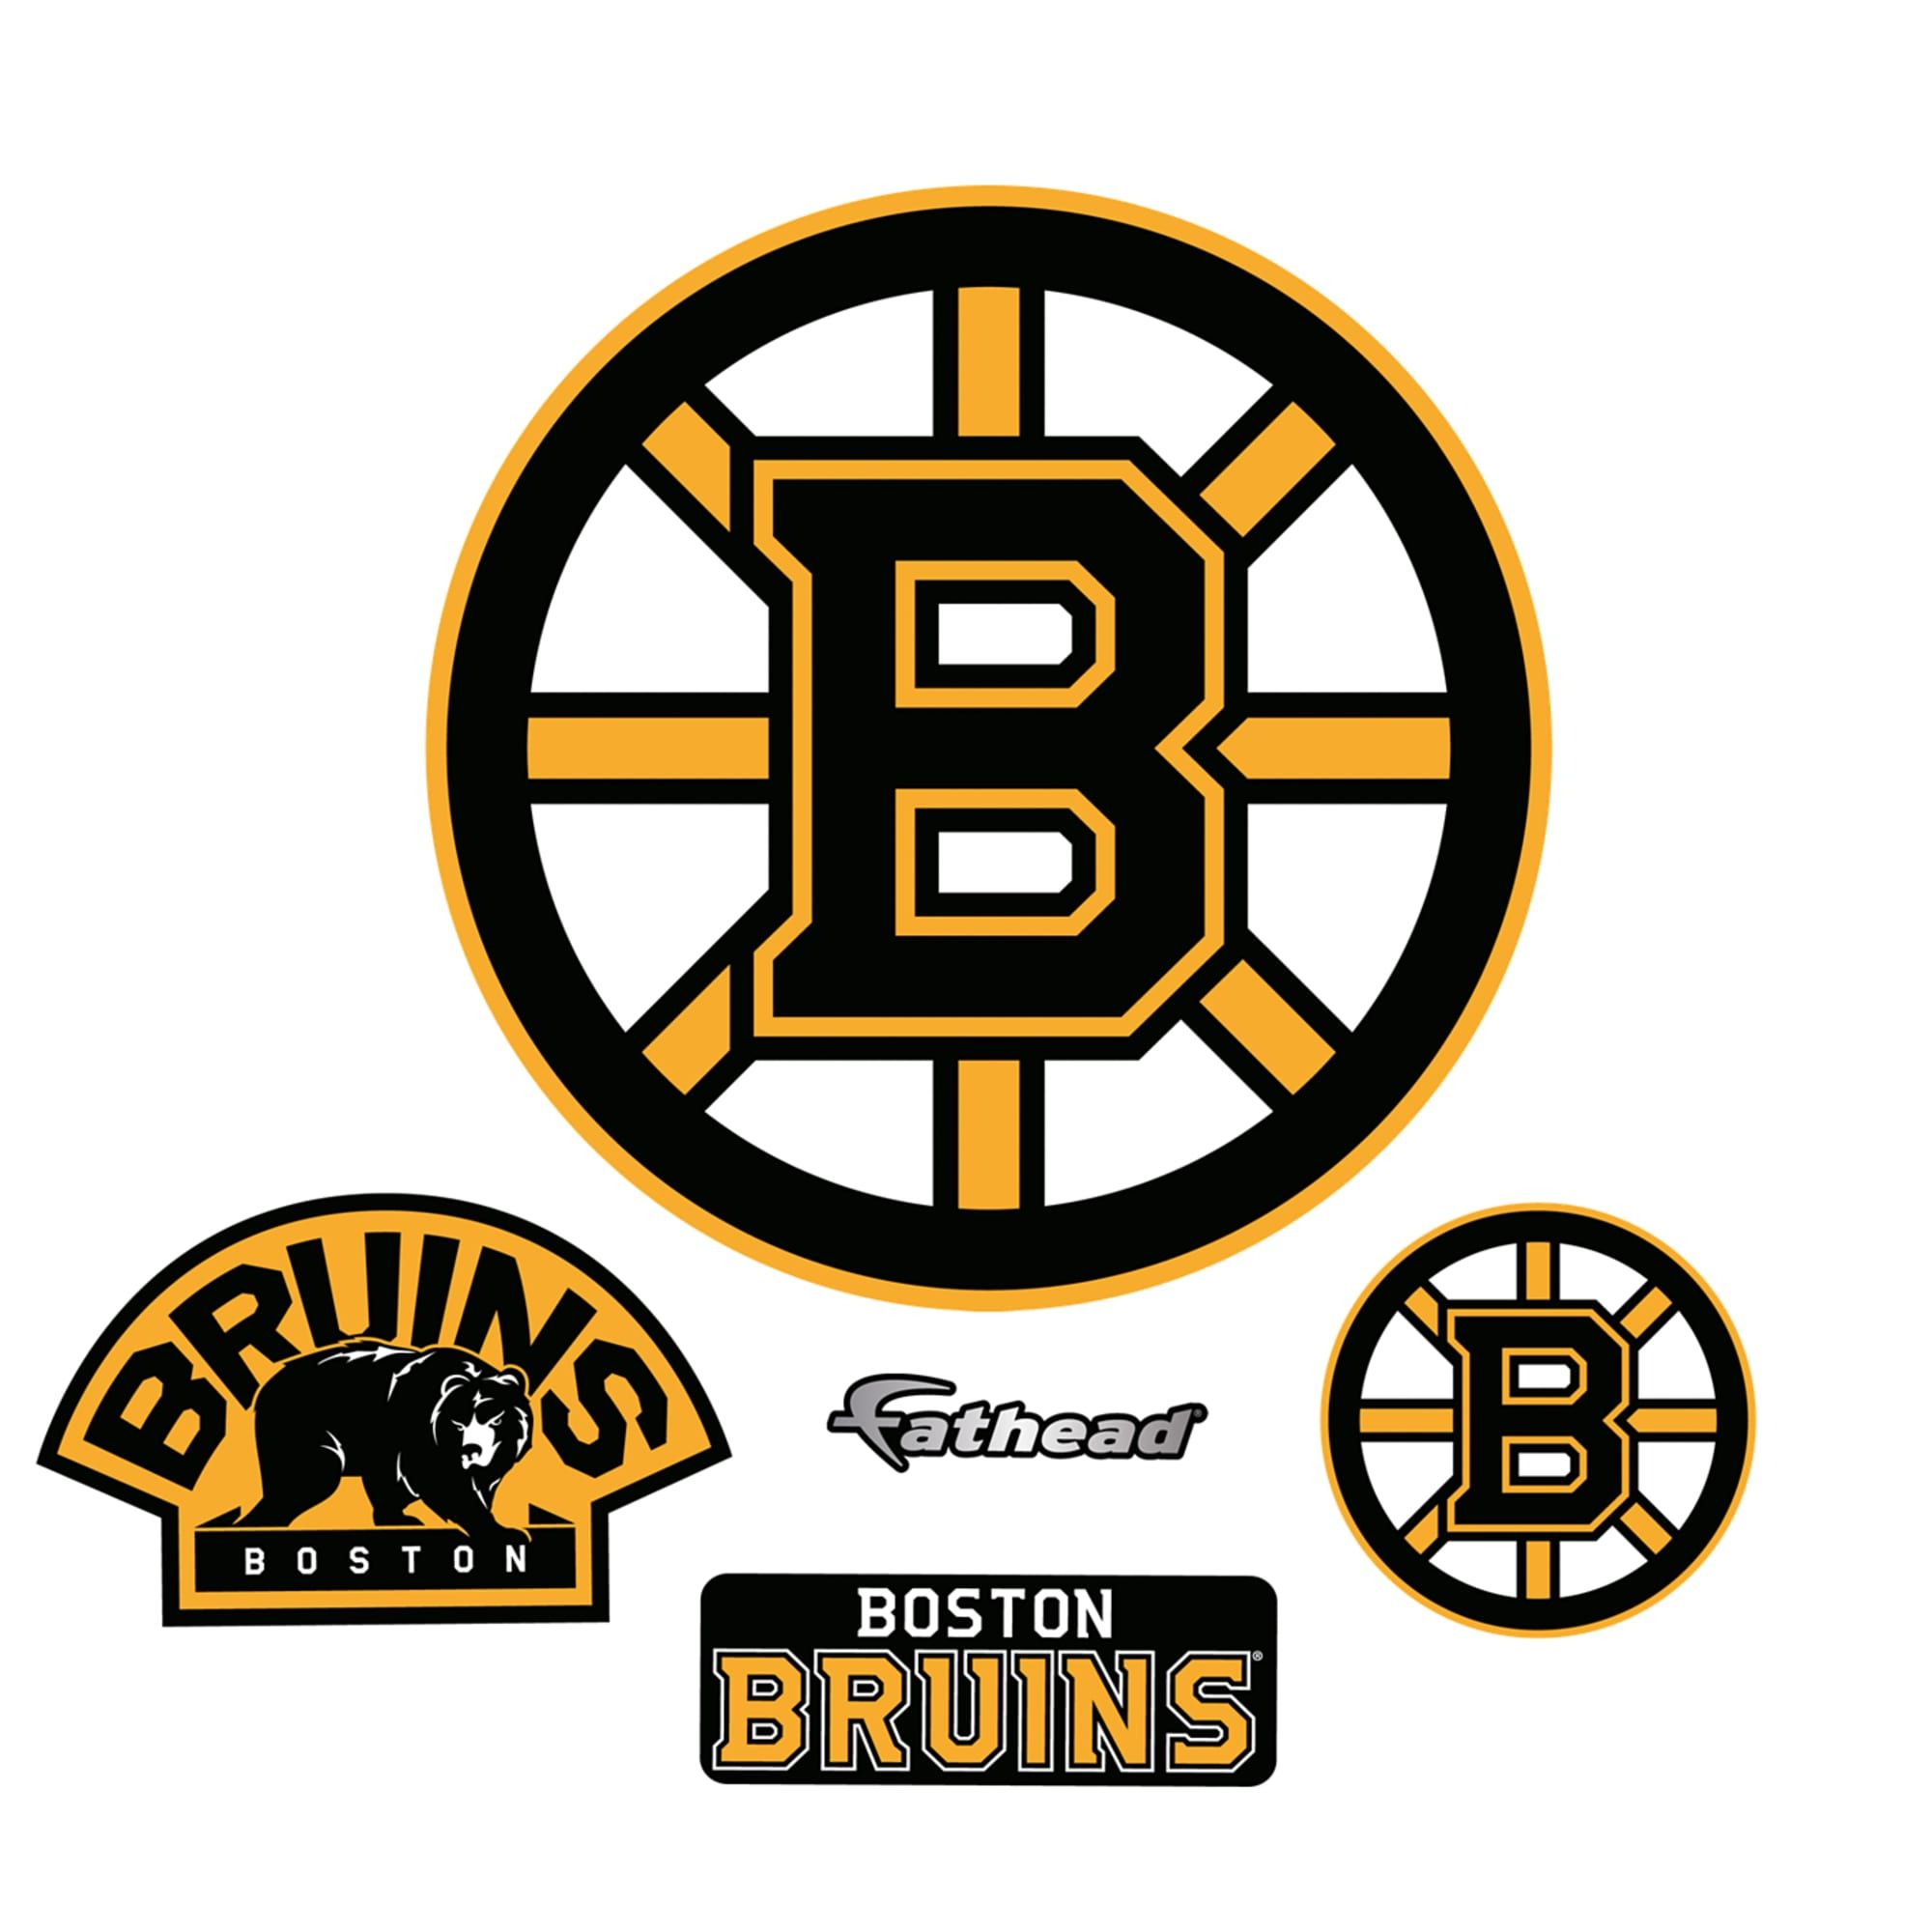 Previewing The Atlantic Division Boston Bruins Boston Bruins Logo Boston Bruins Bruins